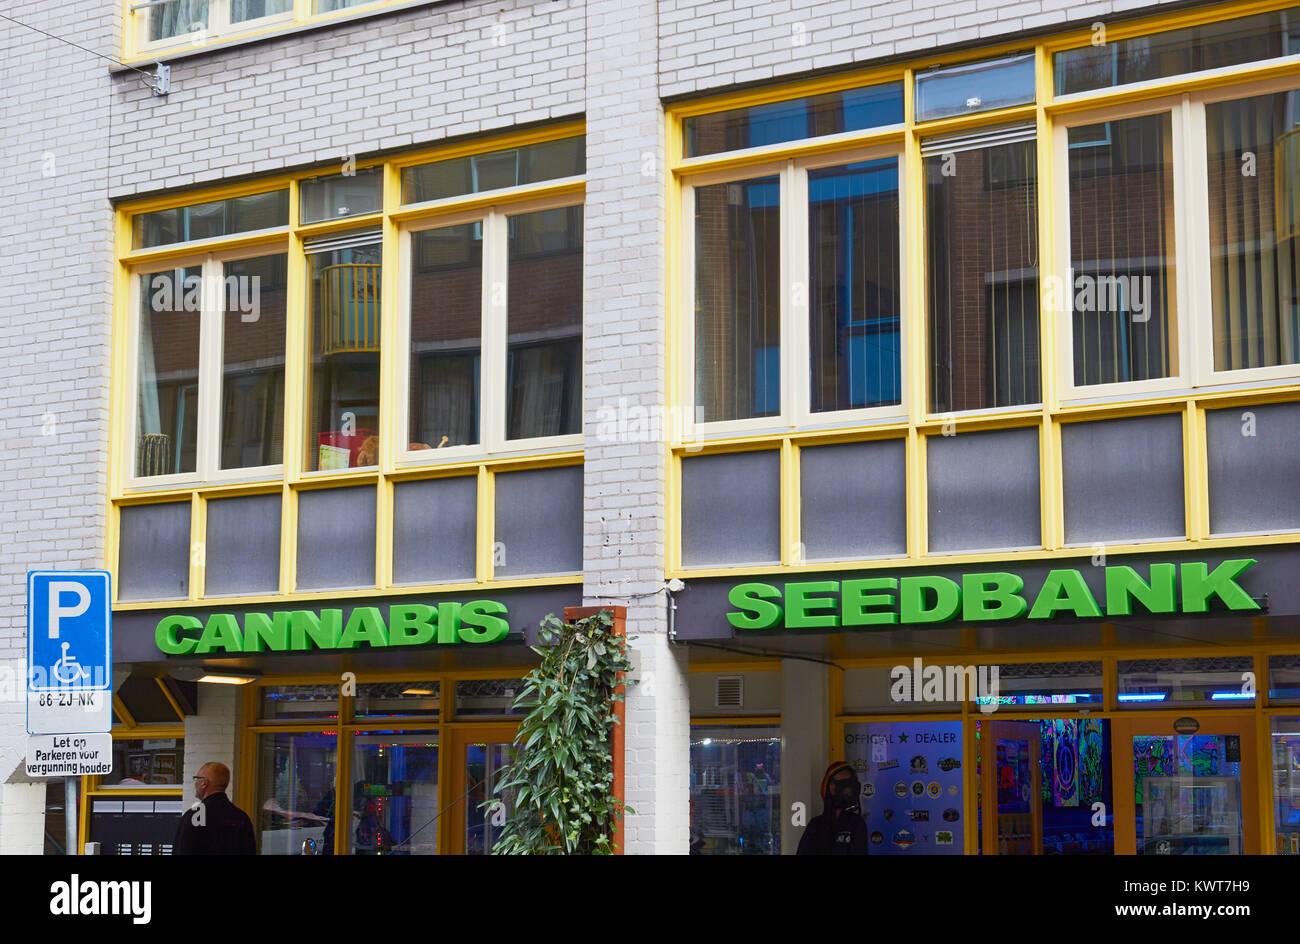 Cannabis Seedbank store on Sint Antoniesbree Straat, Amsterdam, Netherlands - Stock Image